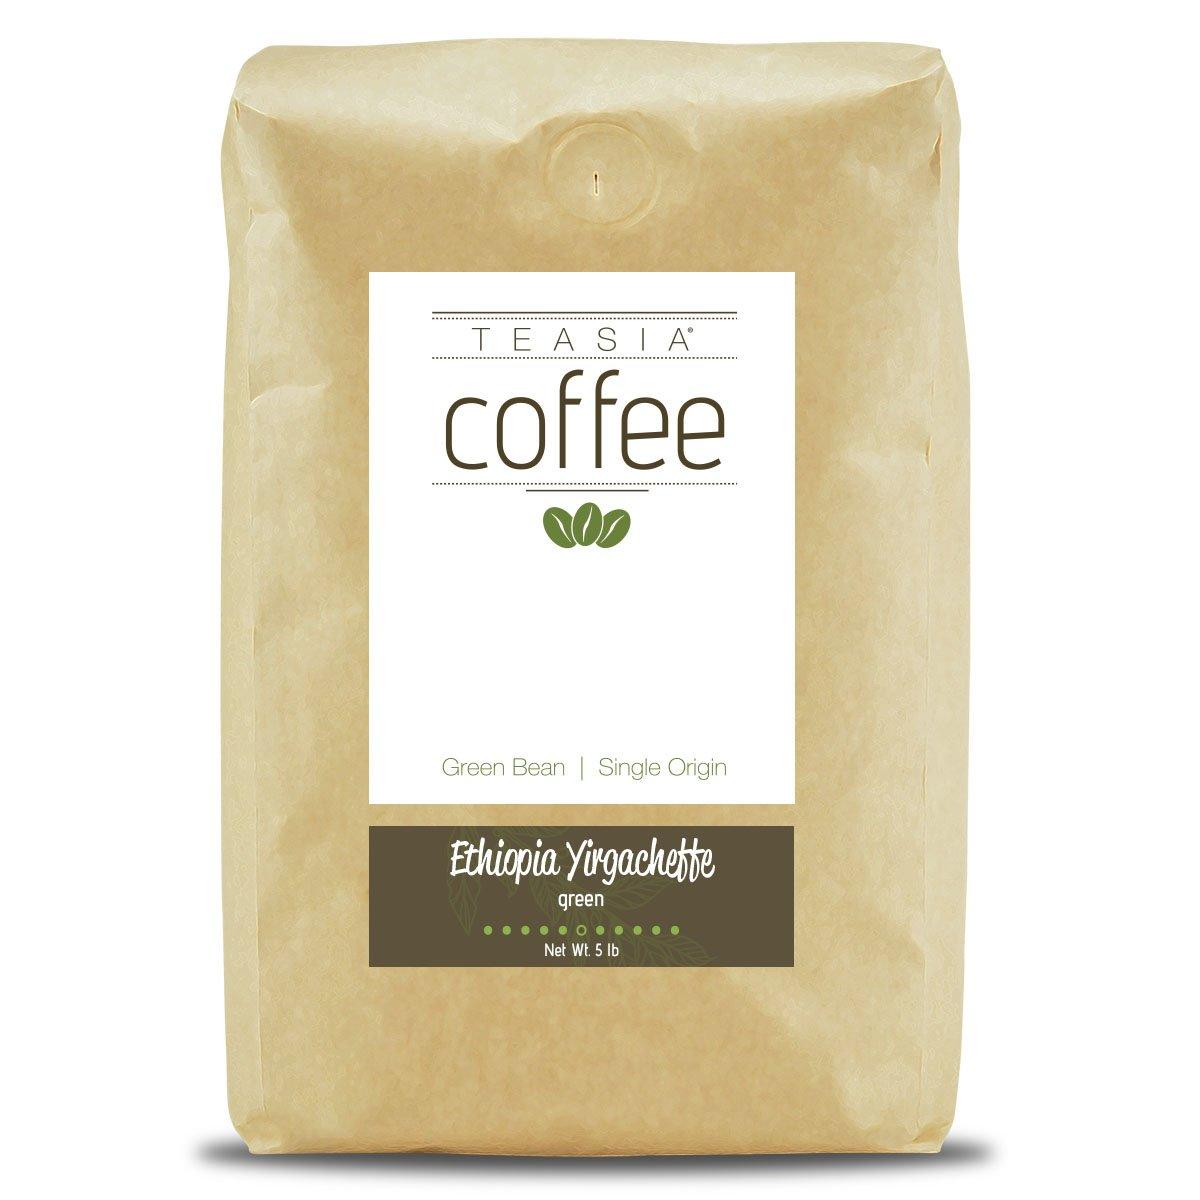 Teasia Coffee, Ethiopia Yirgacheffe, Single Origin, Green Unroasted Whole Coffee Beans, 5-Pound Bag